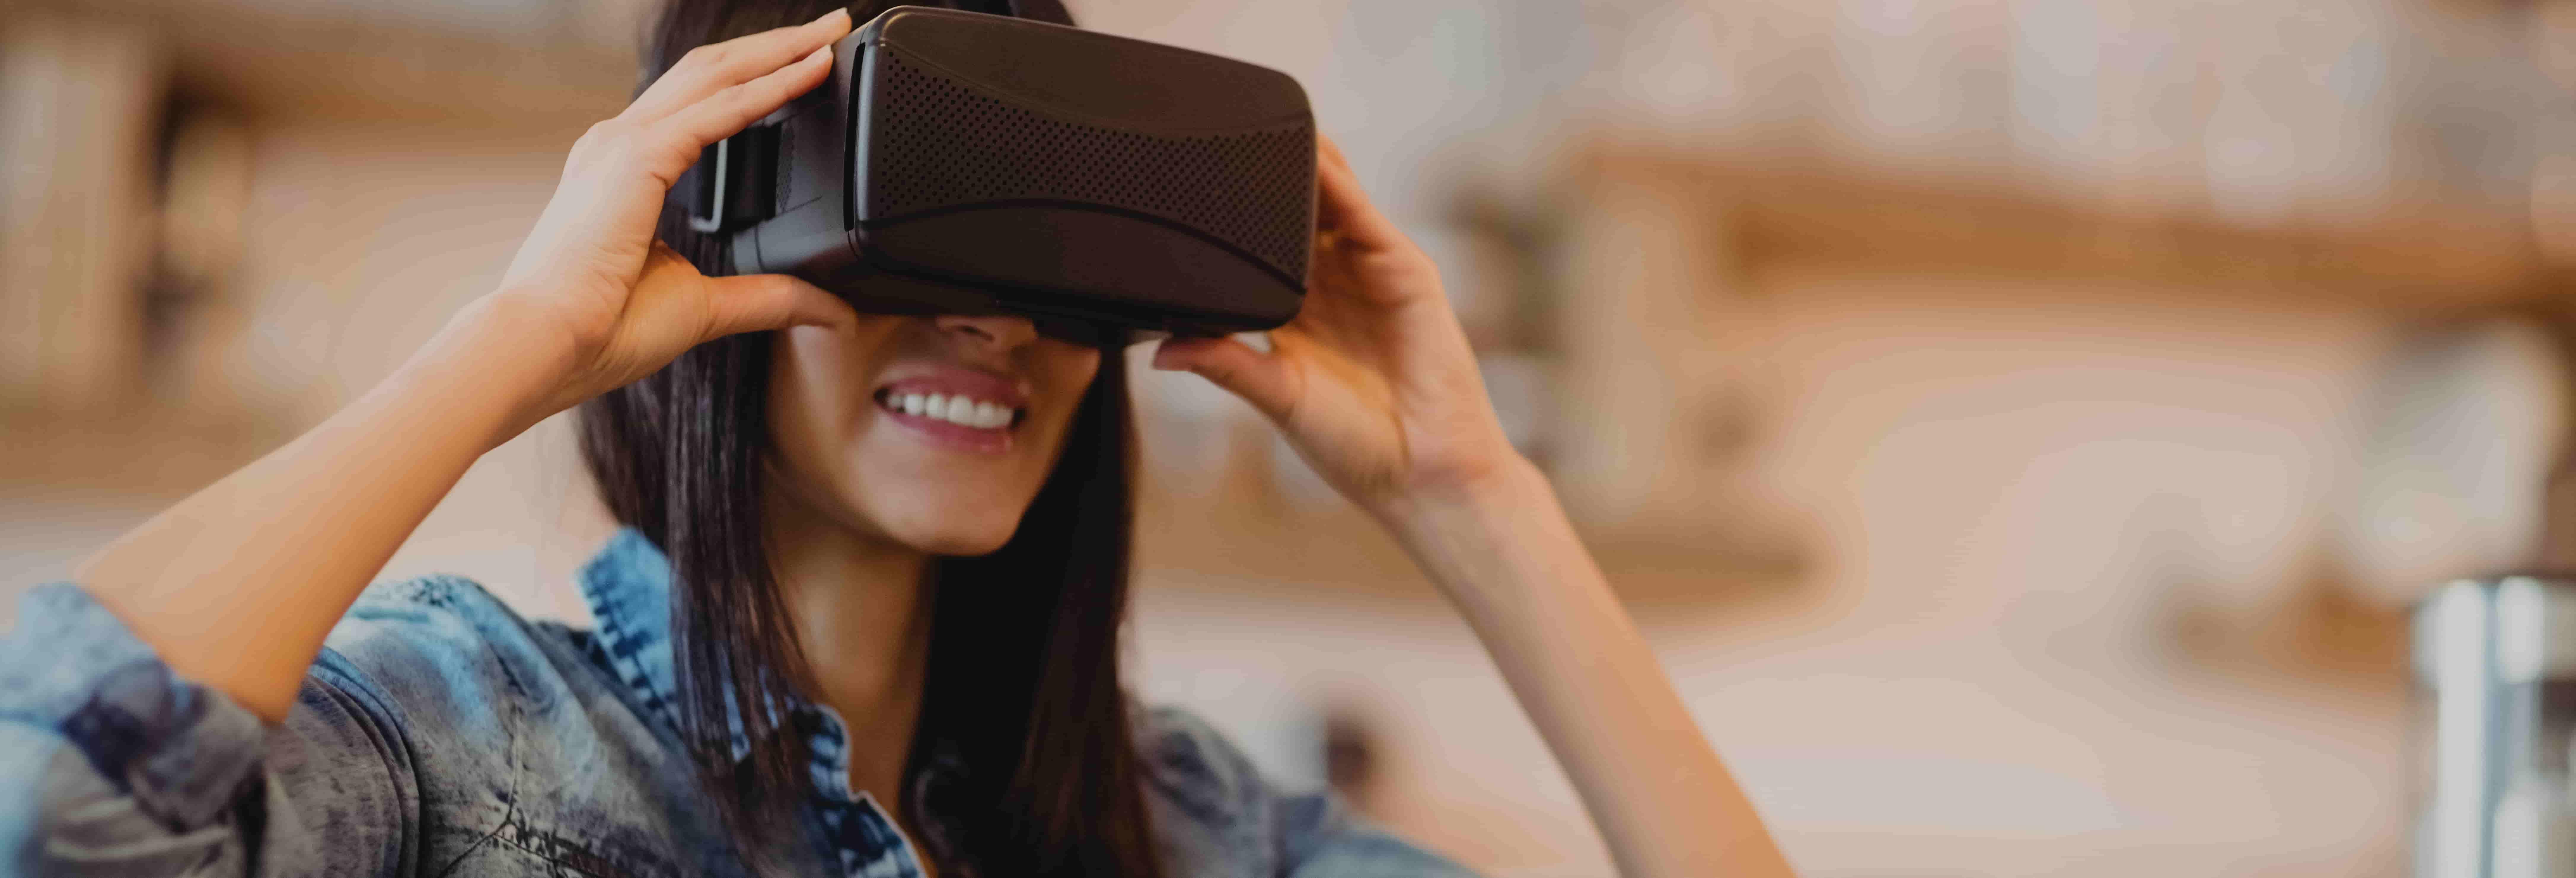 Tour por Tarragona + Experiencia de realidad virtual